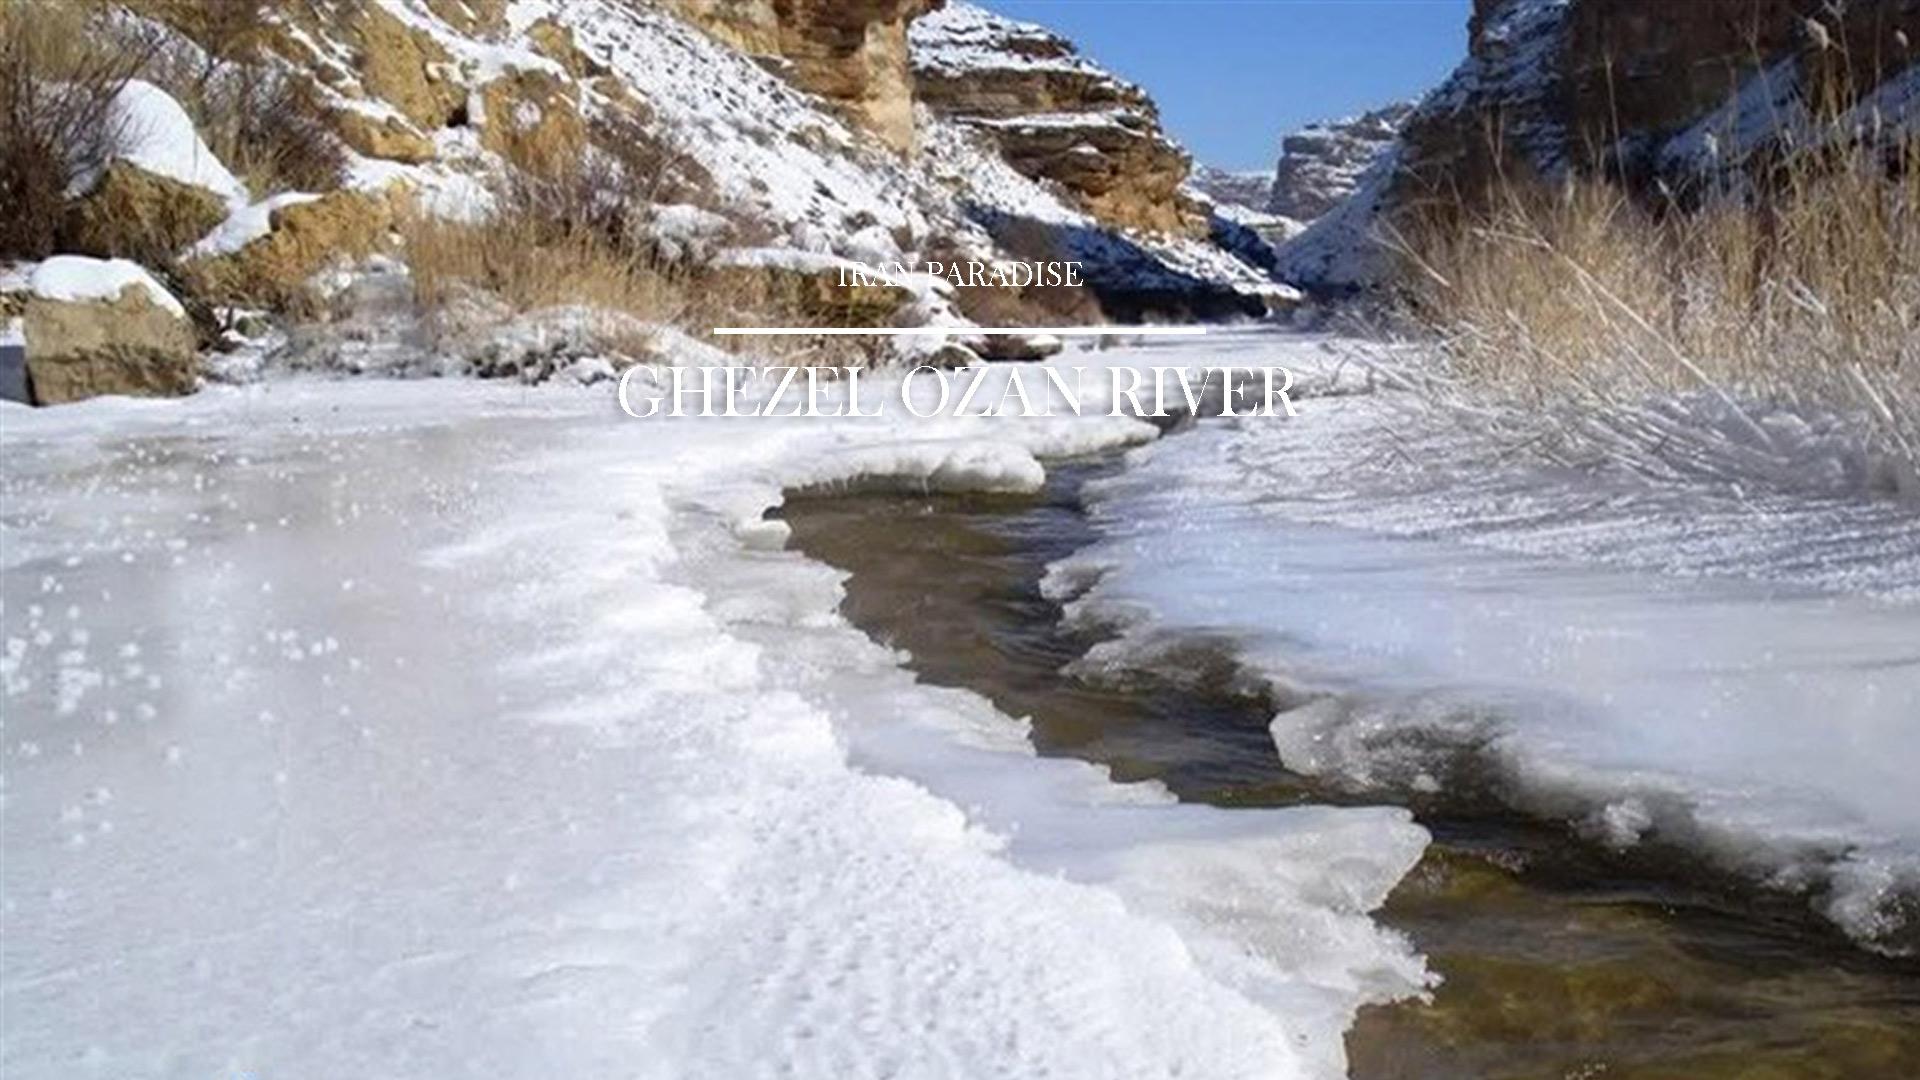 ghezel-ozan-river